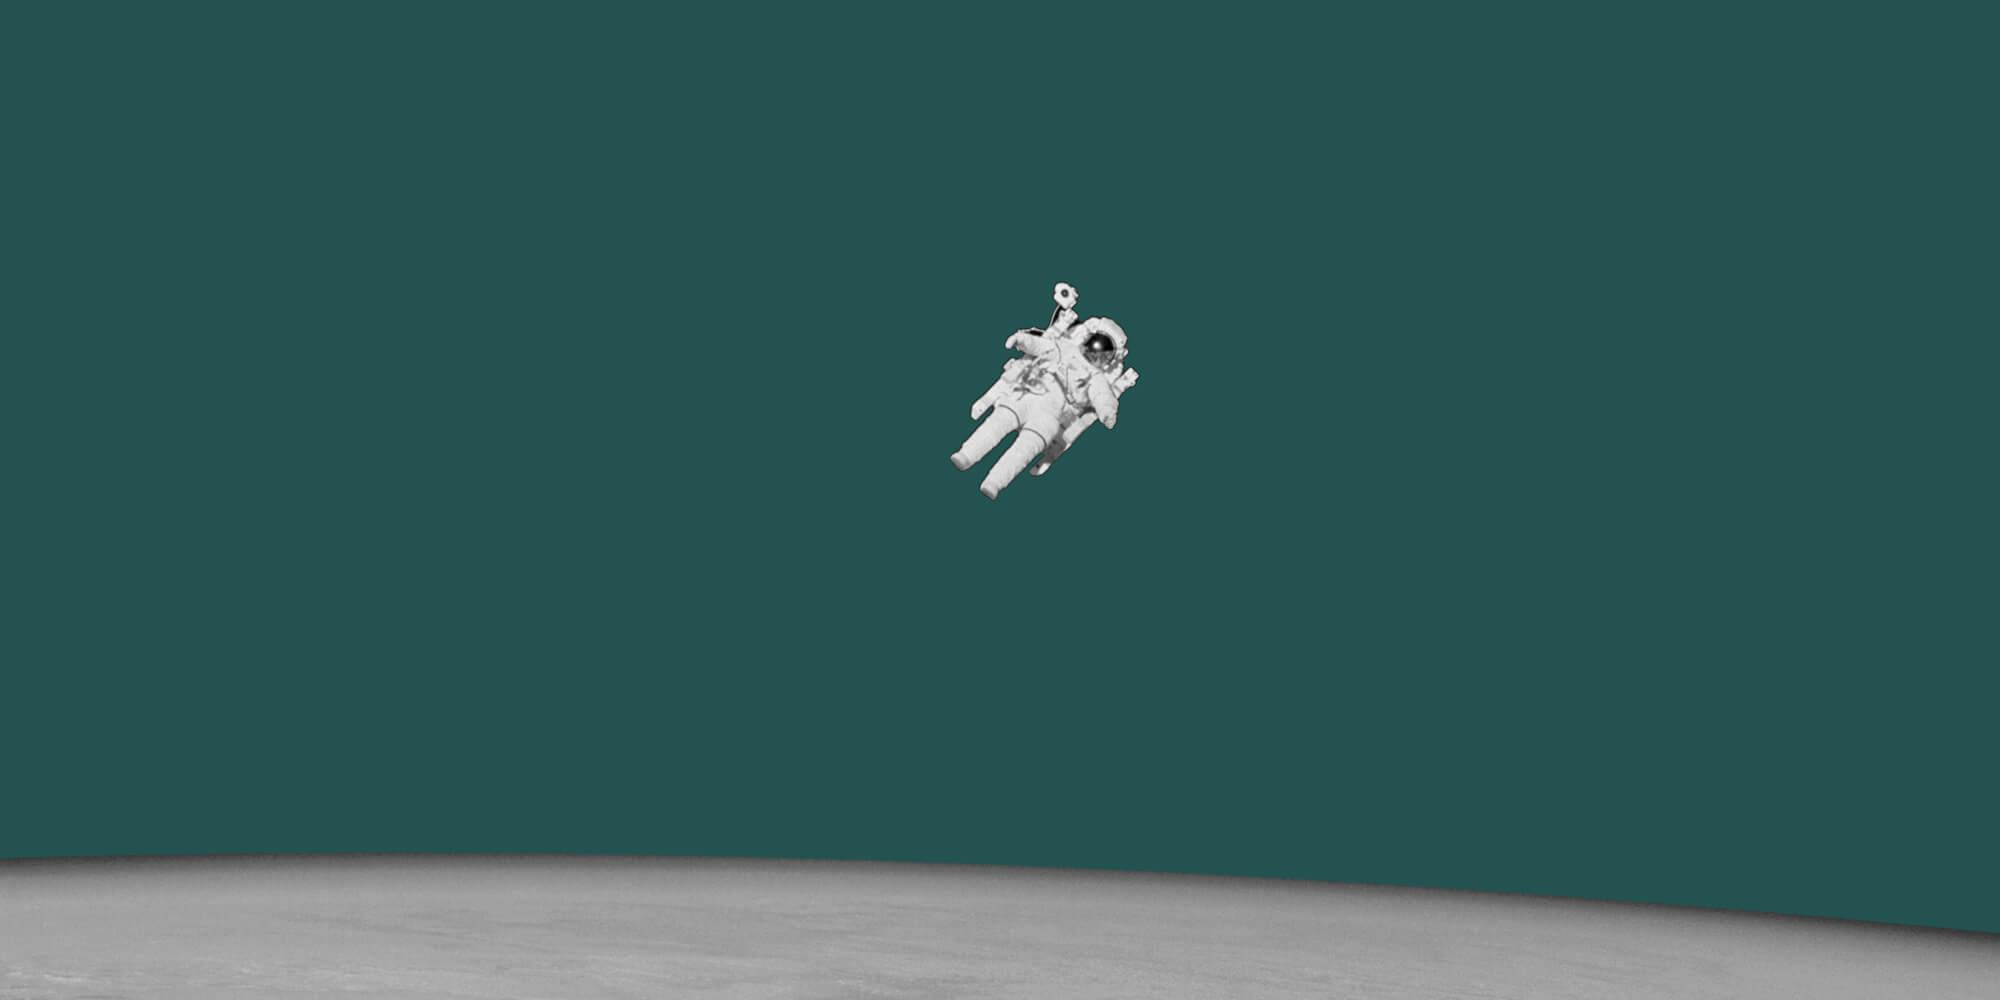 Lone astronaut